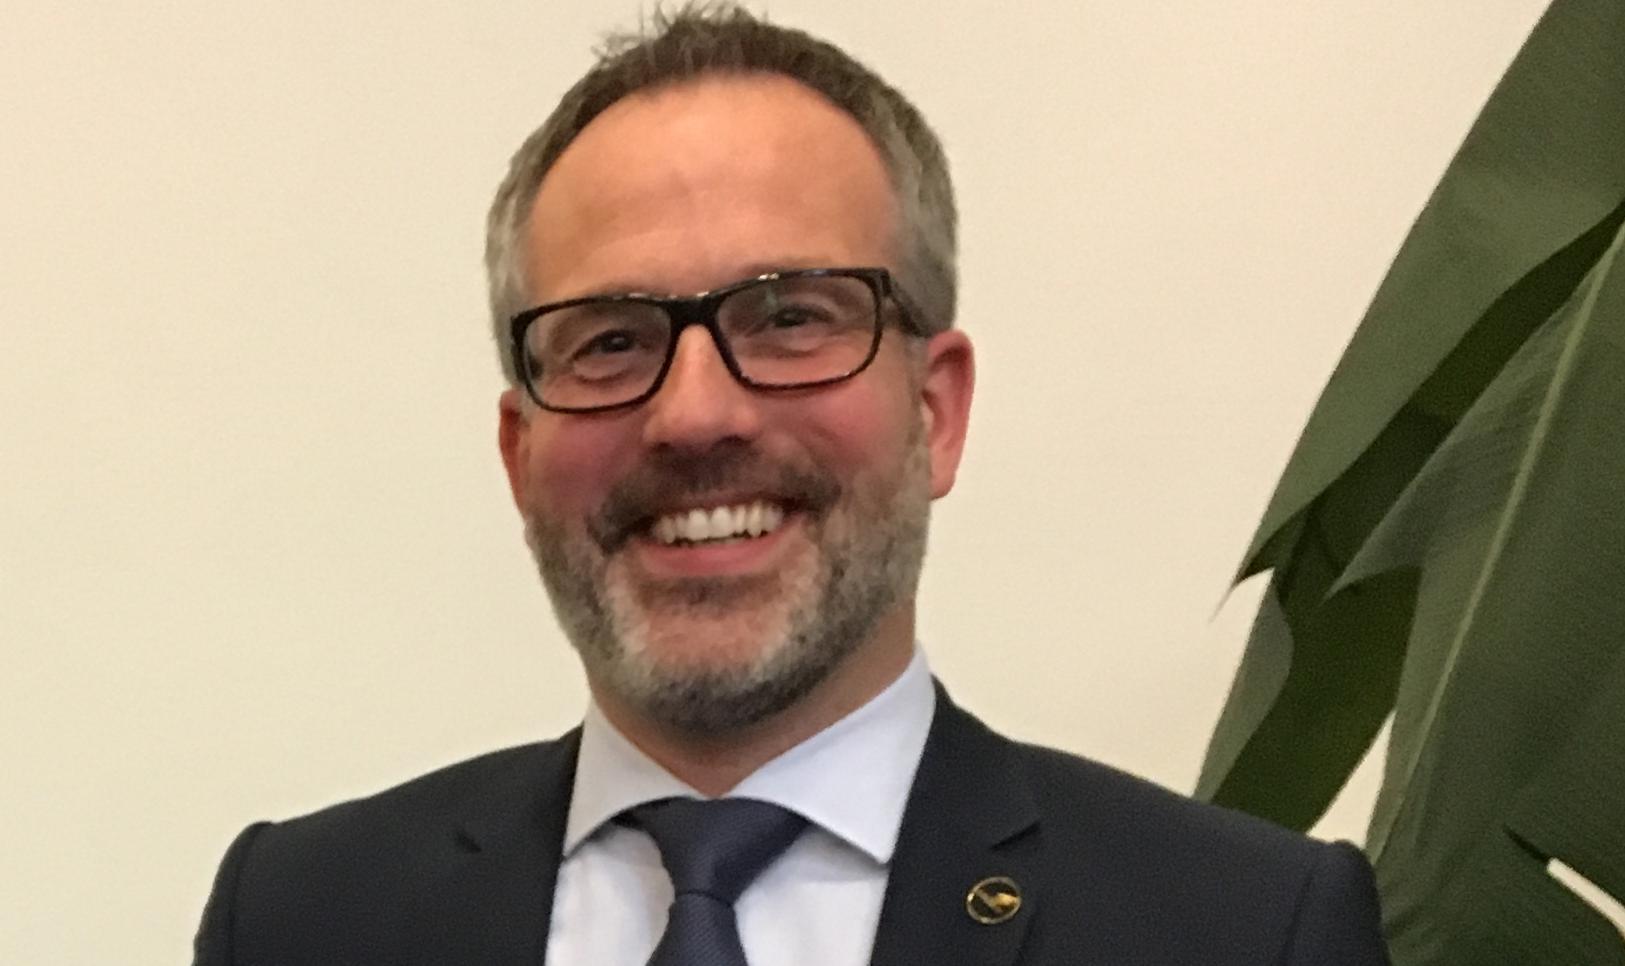 Christian Zahco, tidligere Key Account Manager hos Lufthansa Group. (Privatfoto)